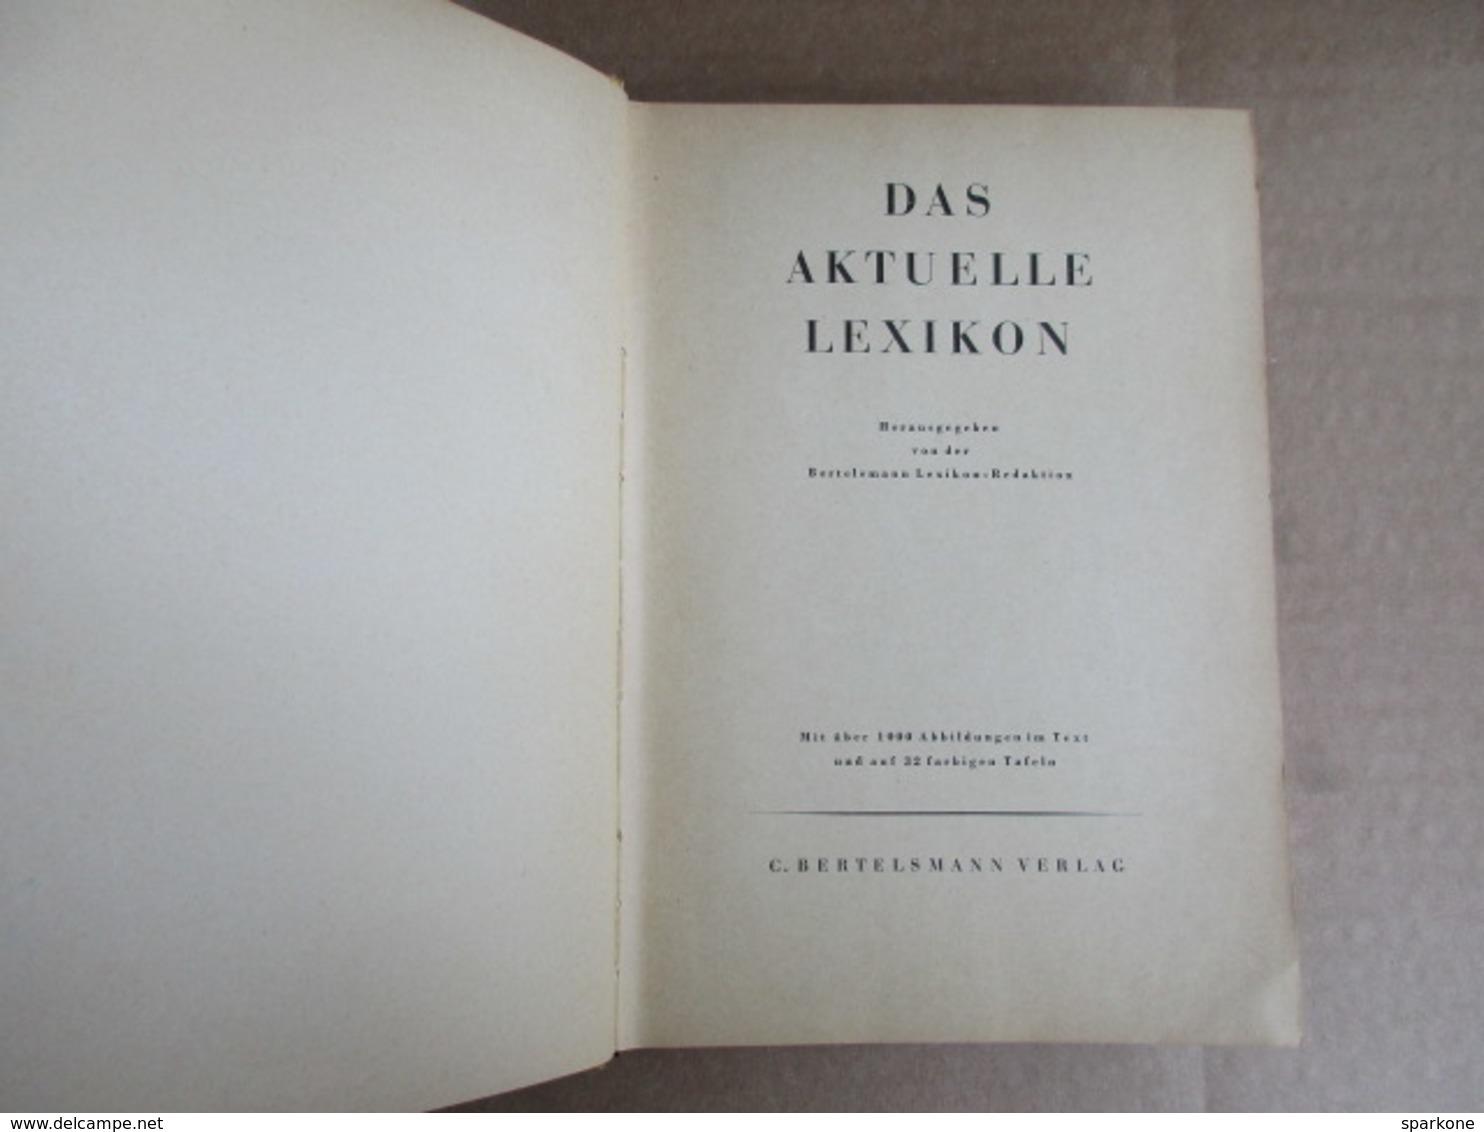 Das Aktuelle Lexikon - Lexiques